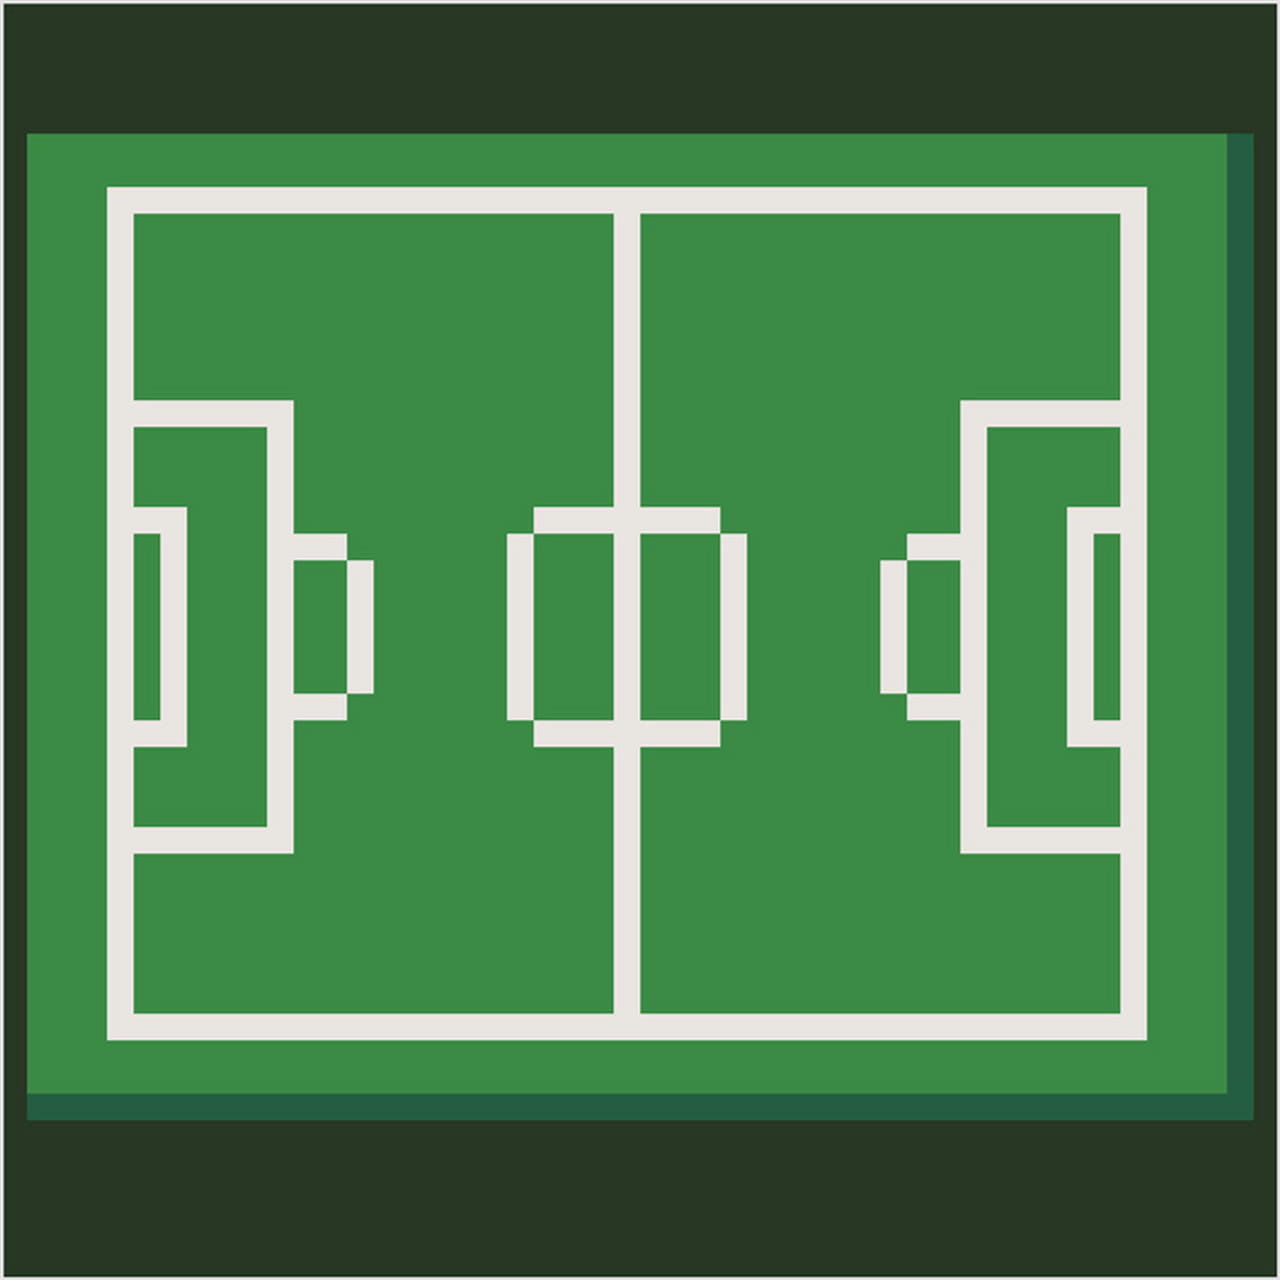 Terrain De Football En Pixel Art